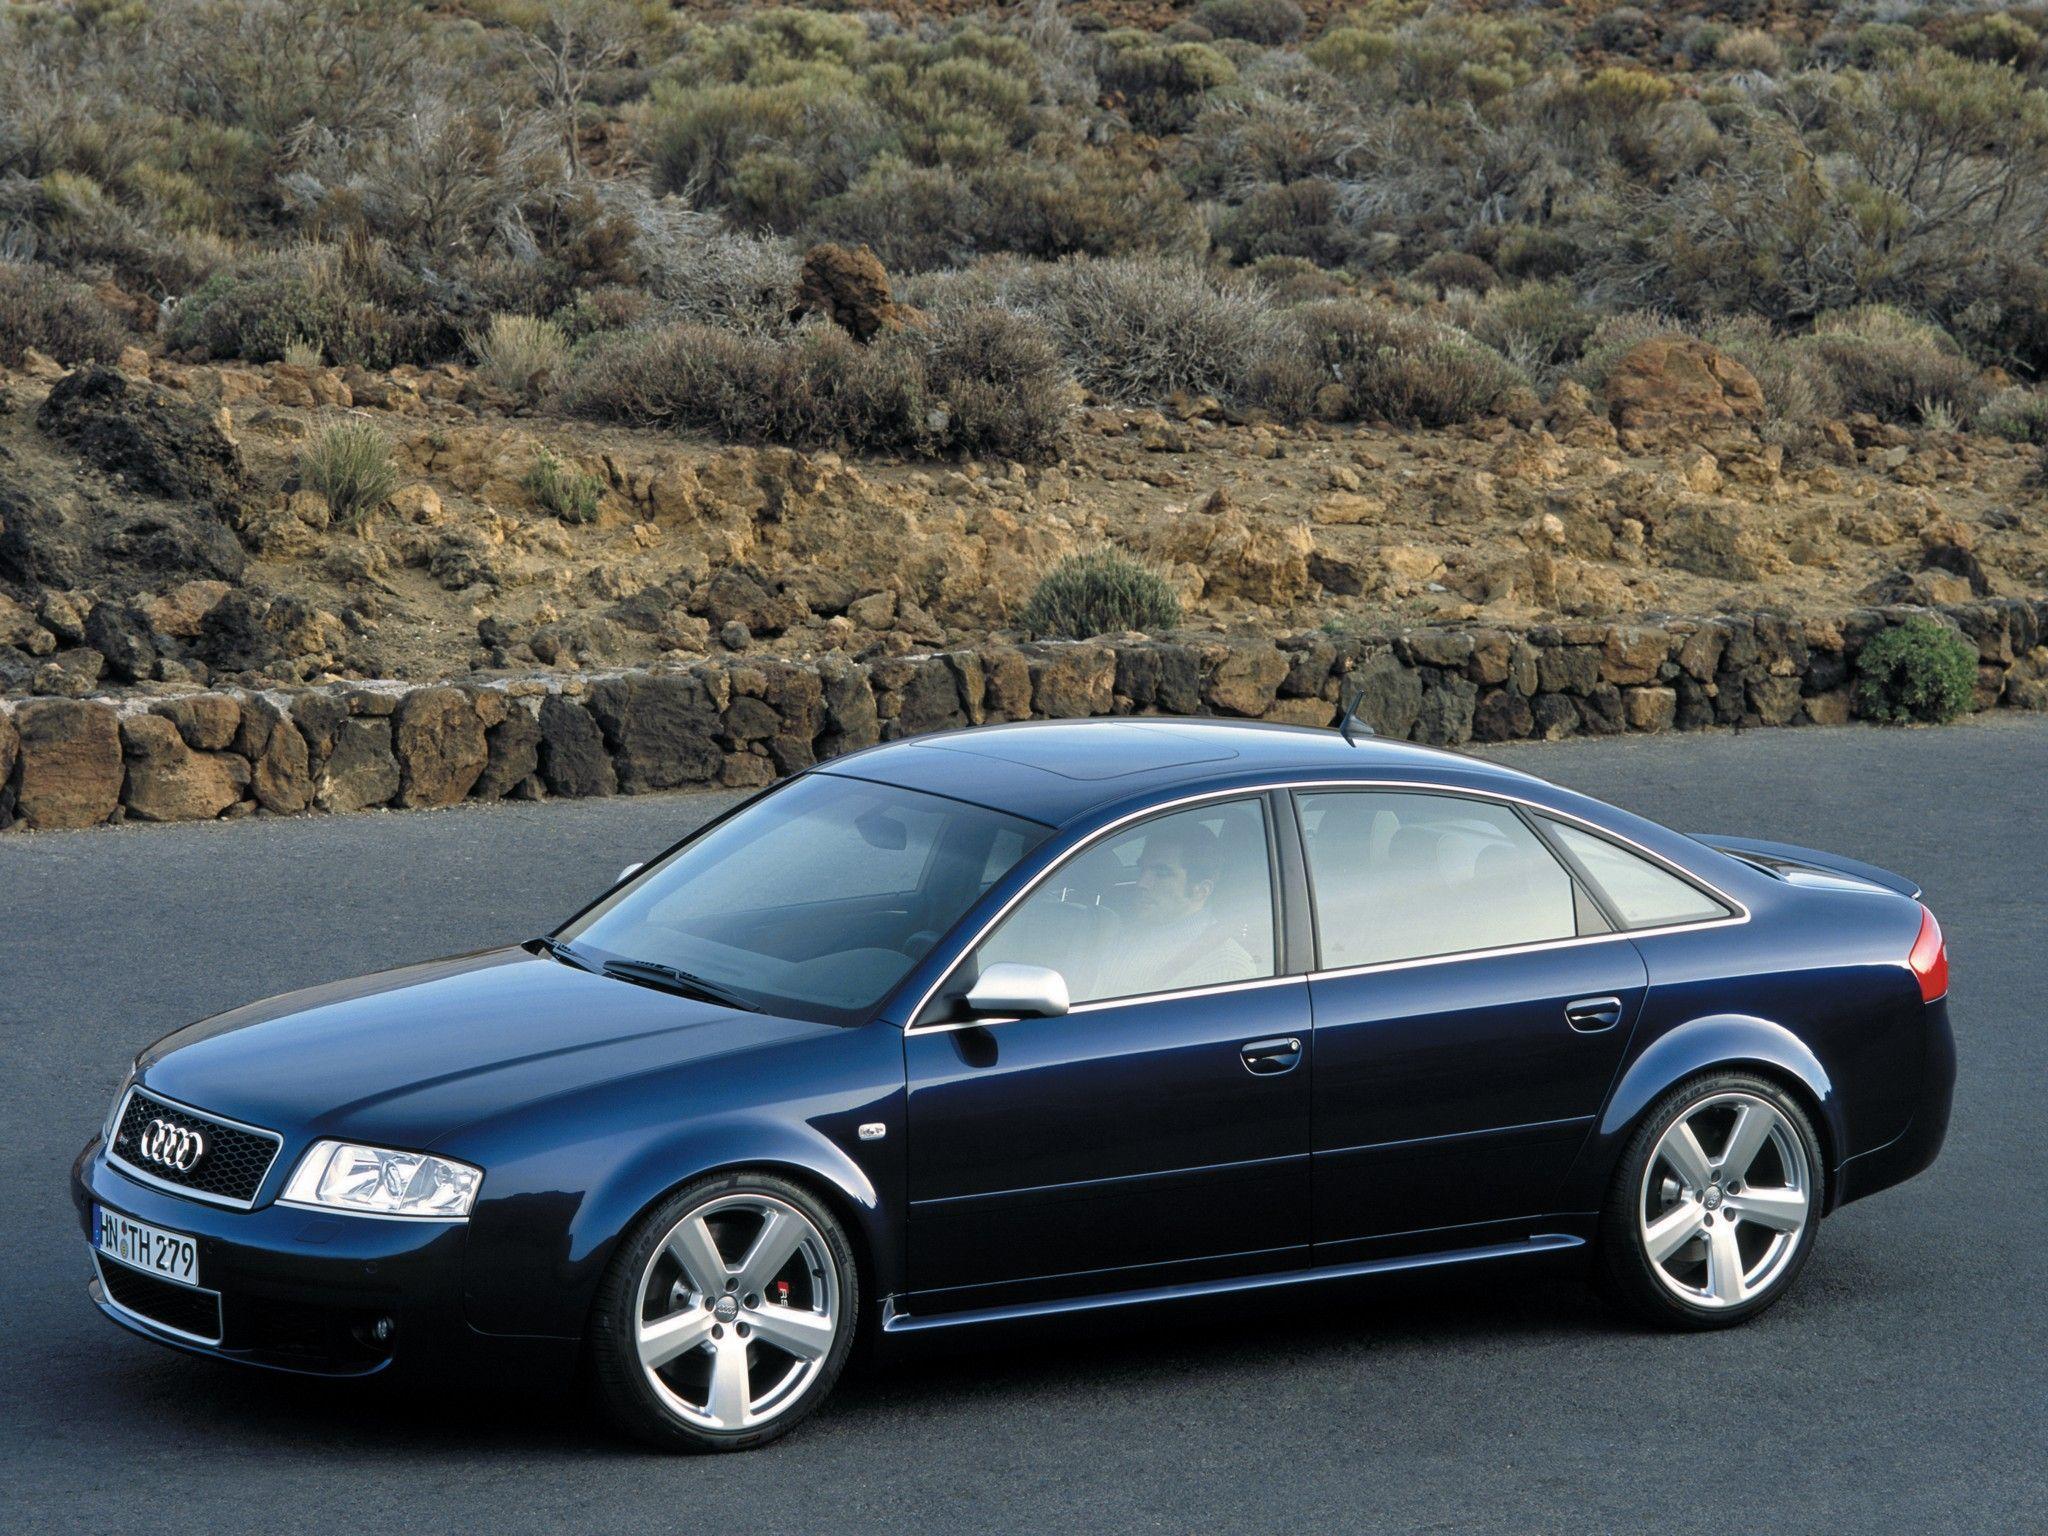 Kelebihan Kekurangan Audi 2002 Murah Berkualitas